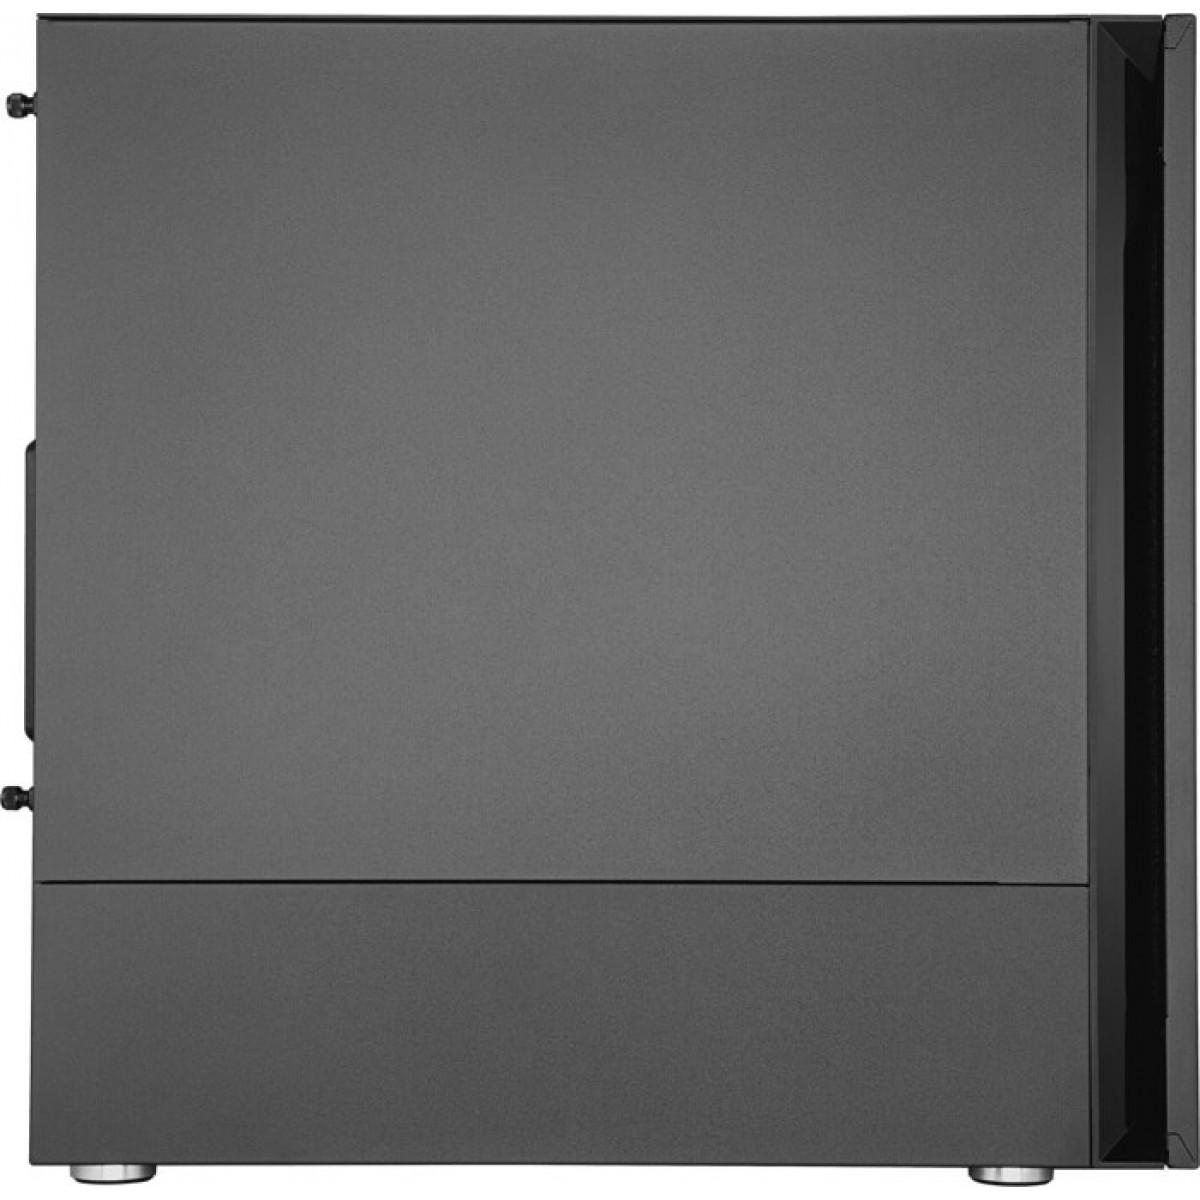 Gabinete Gamer Cooler Master Silencio S400, Mid Tower, Black, MCS-S400-KG5N-S00, Sem Fonte, Com 2 Fans